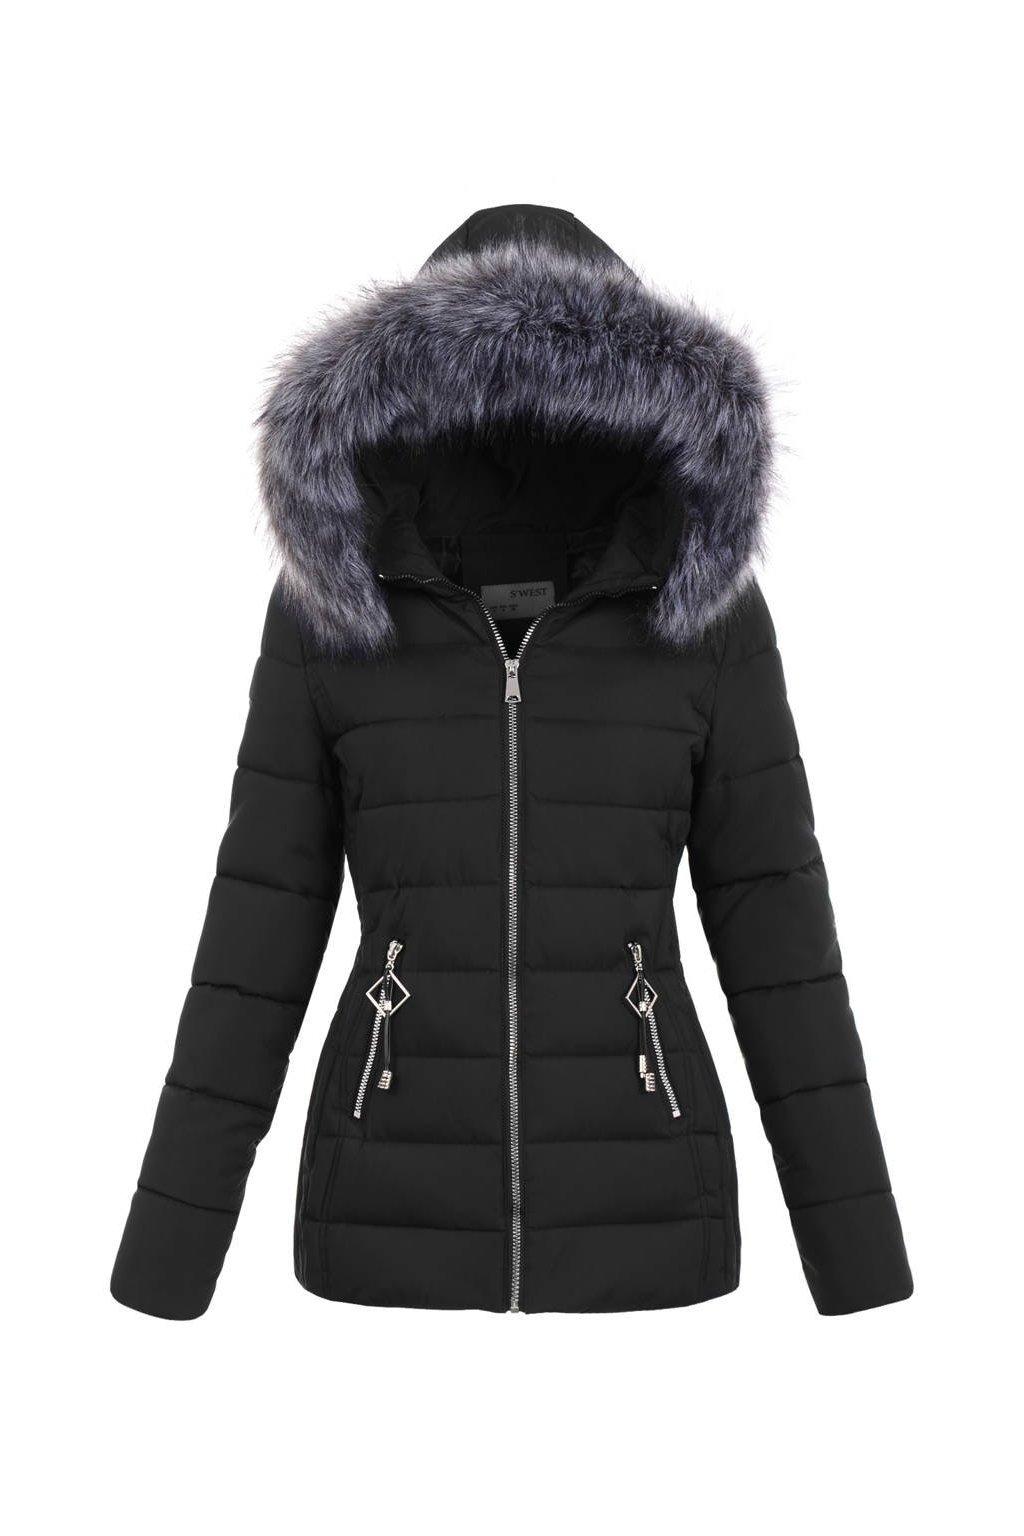 Dámska zimná bunda s kapucňou 5138 čierna